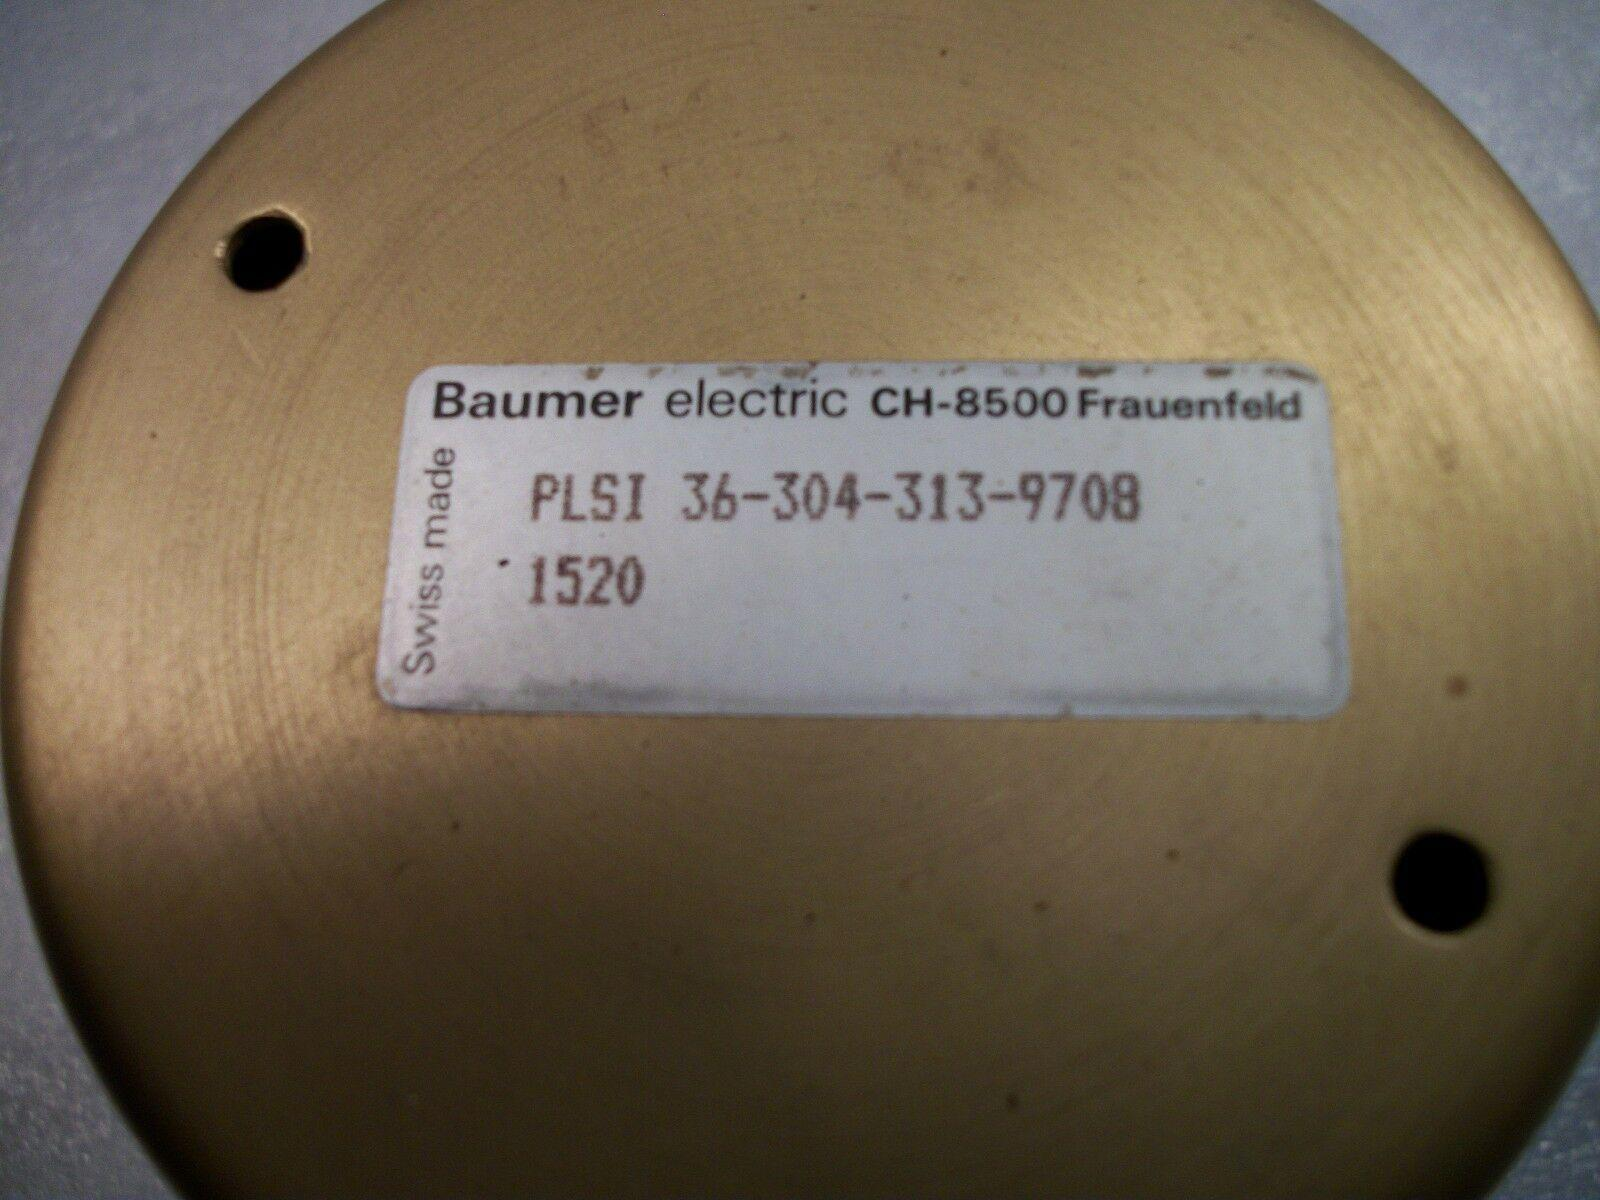 Baumer Electronic Encoder PLSI 36-304-313-9709-1520 Harosyn 11BRCT-300-M-10A